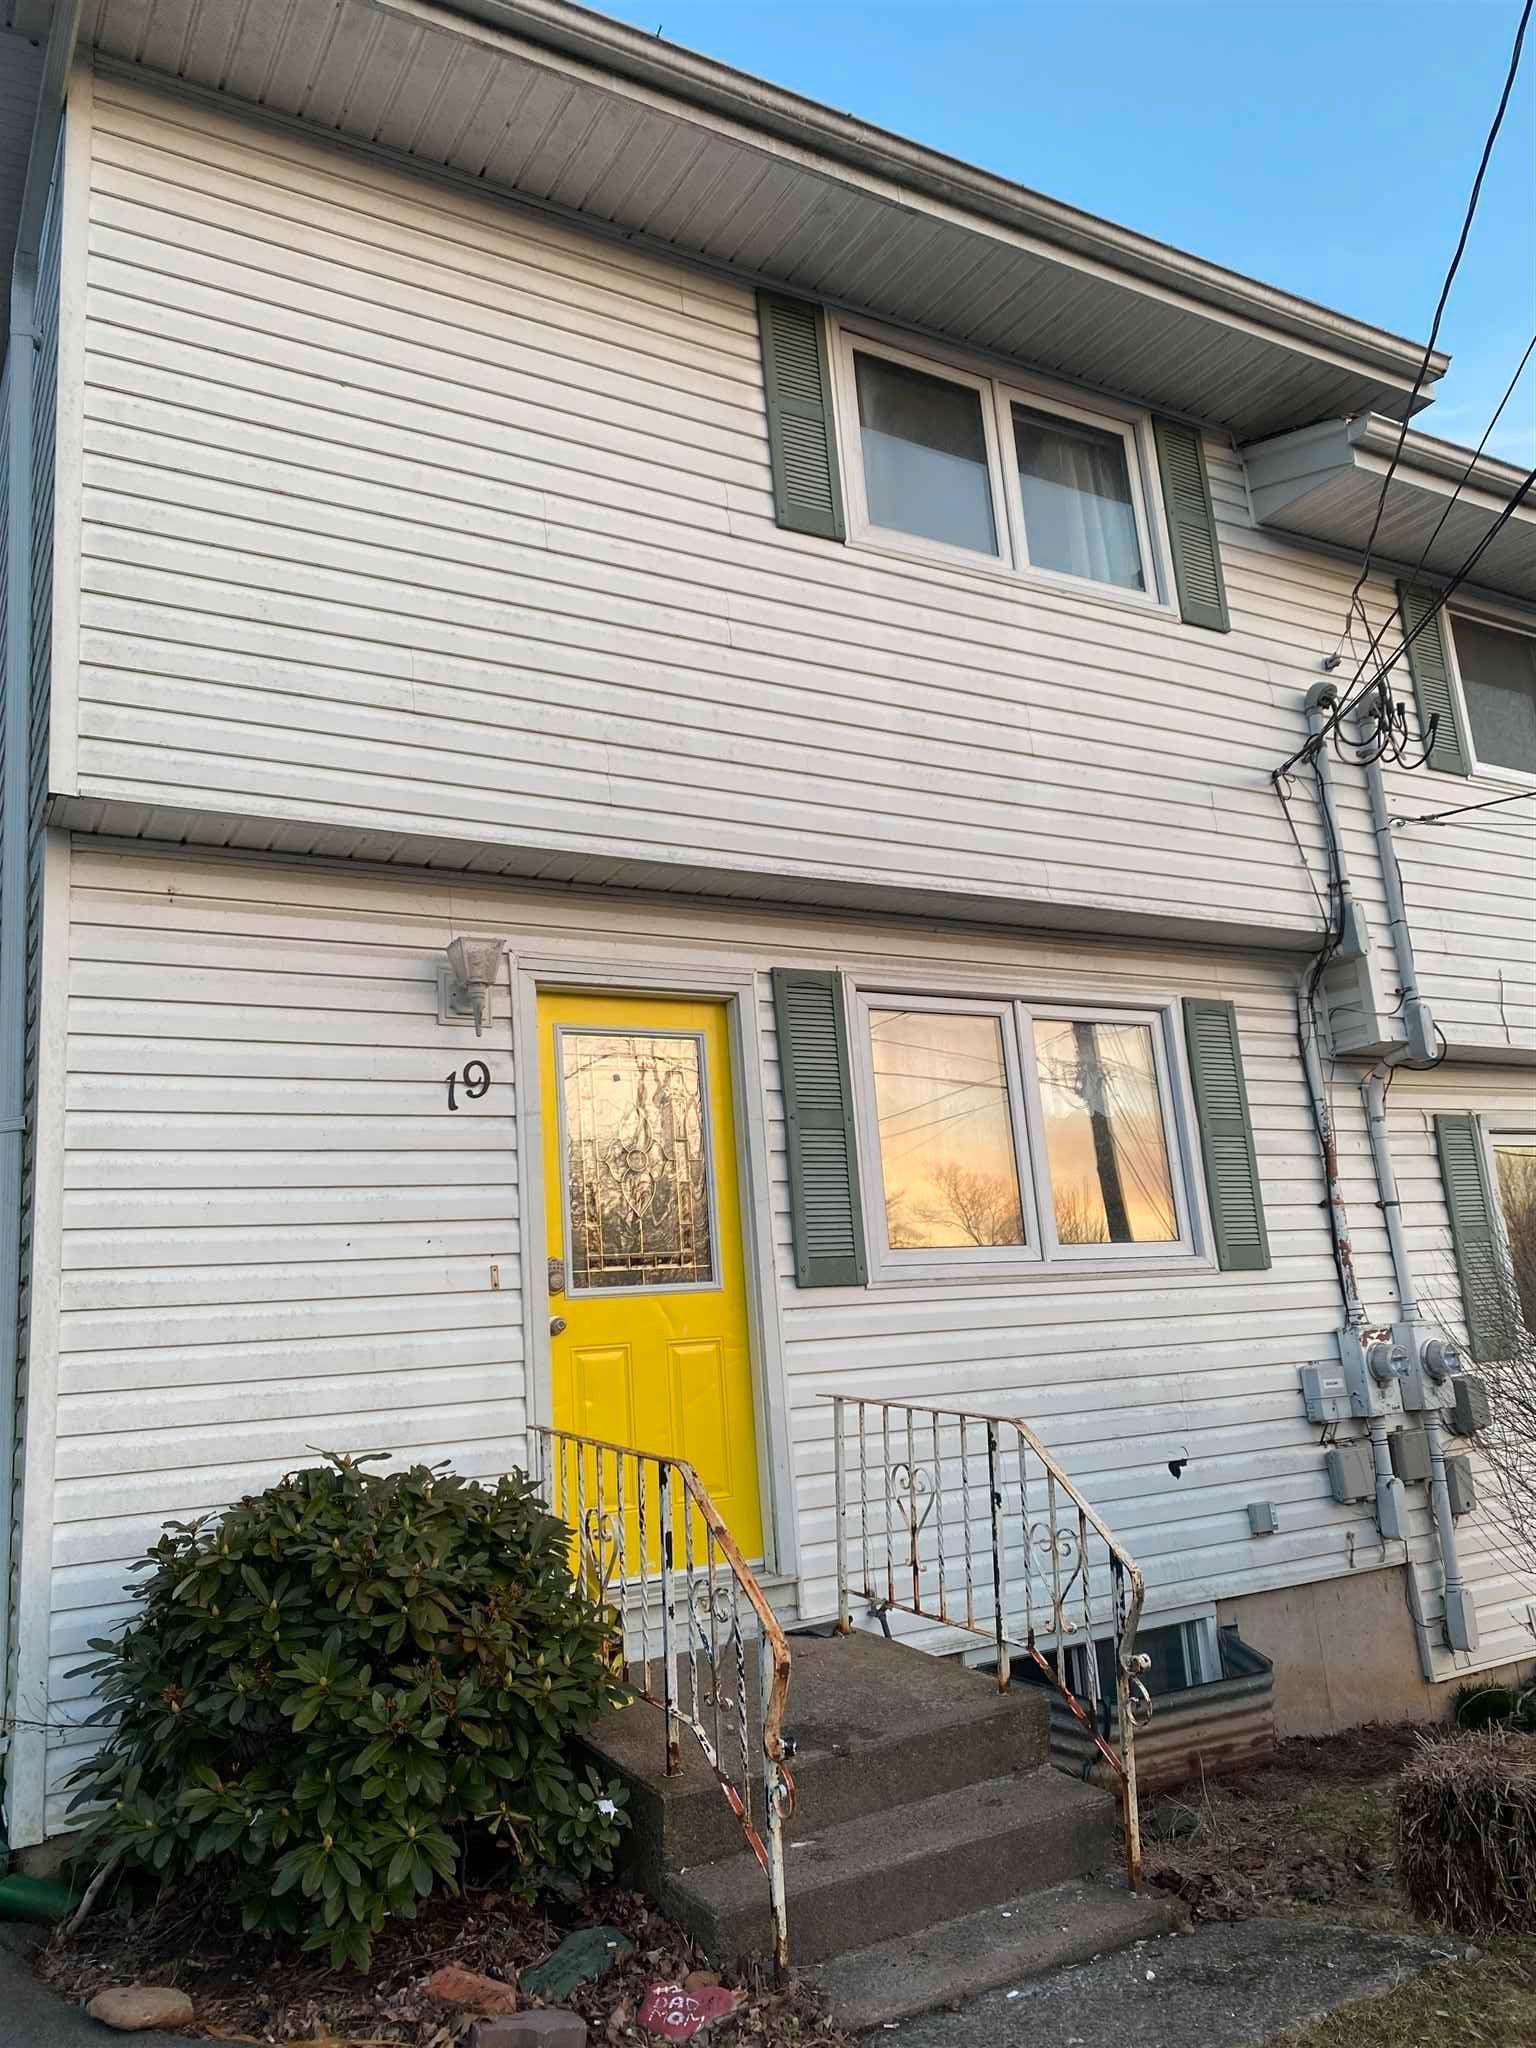 Main Photo: 19 Quaker Crescent in Lower Sackville: 25-Sackville Residential for sale (Halifax-Dartmouth)  : MLS®# 202107656